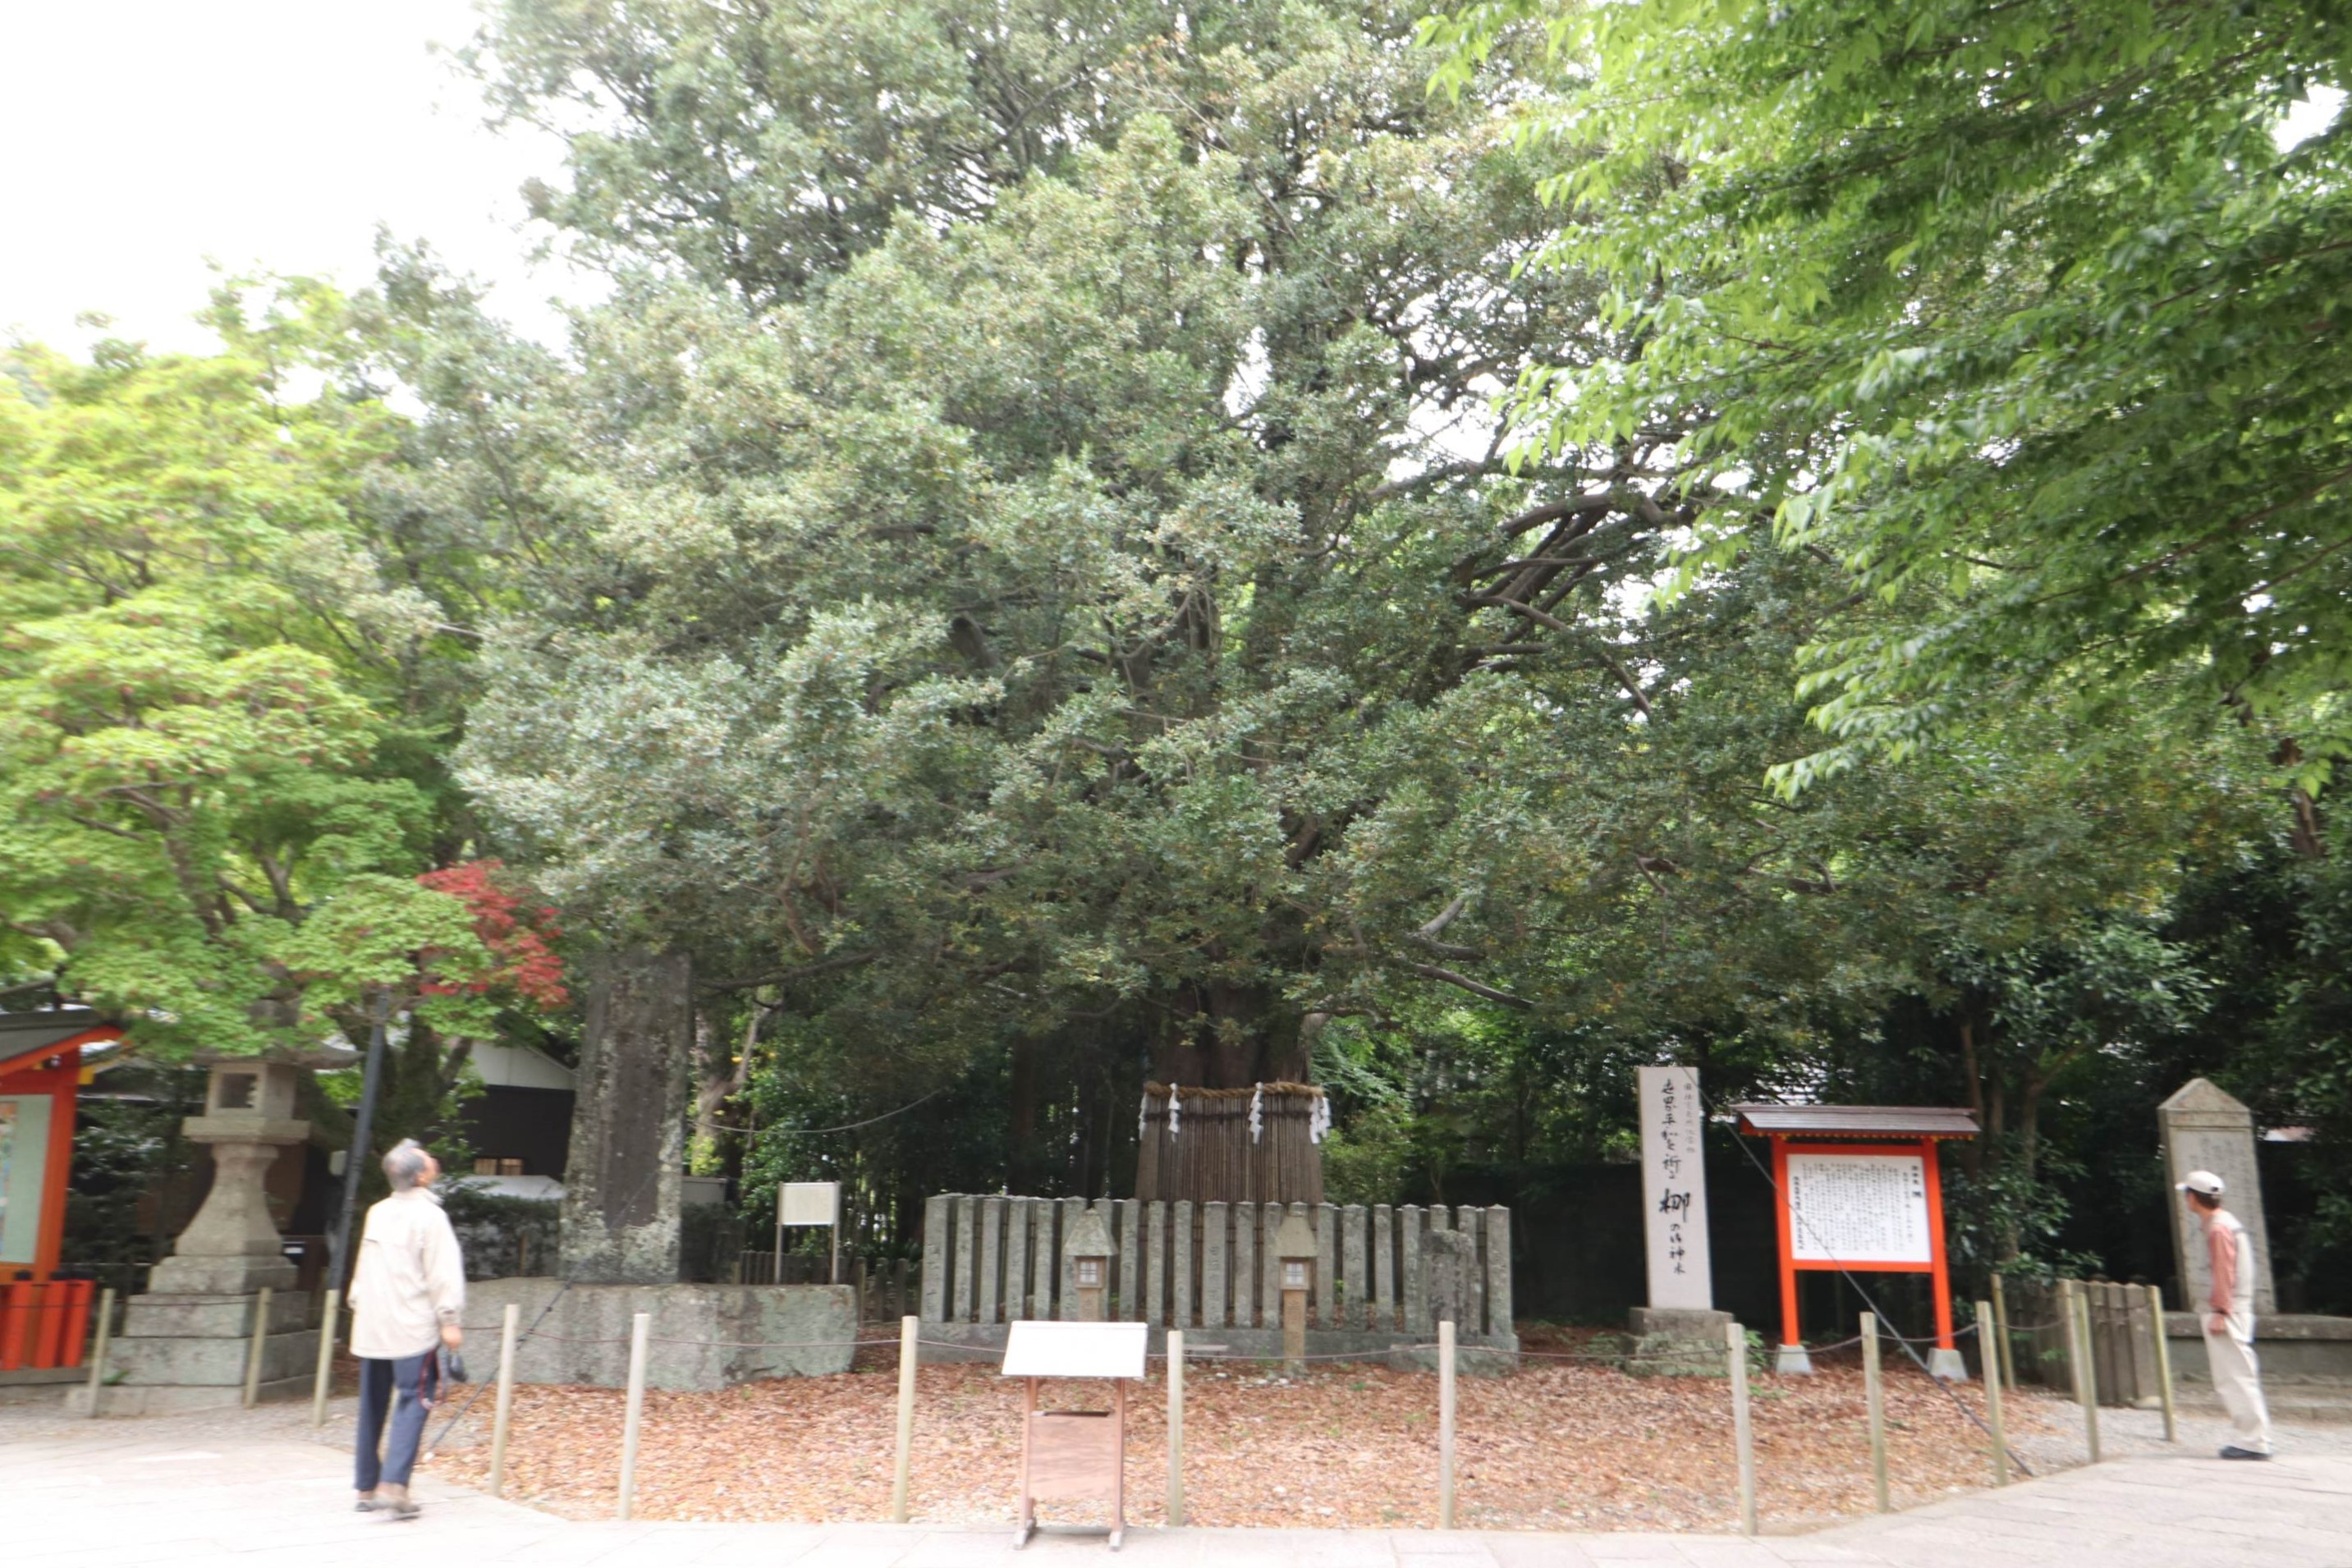 http://rieko-sugihara.com/photo_essay/item/IMG_1801_R.JPG